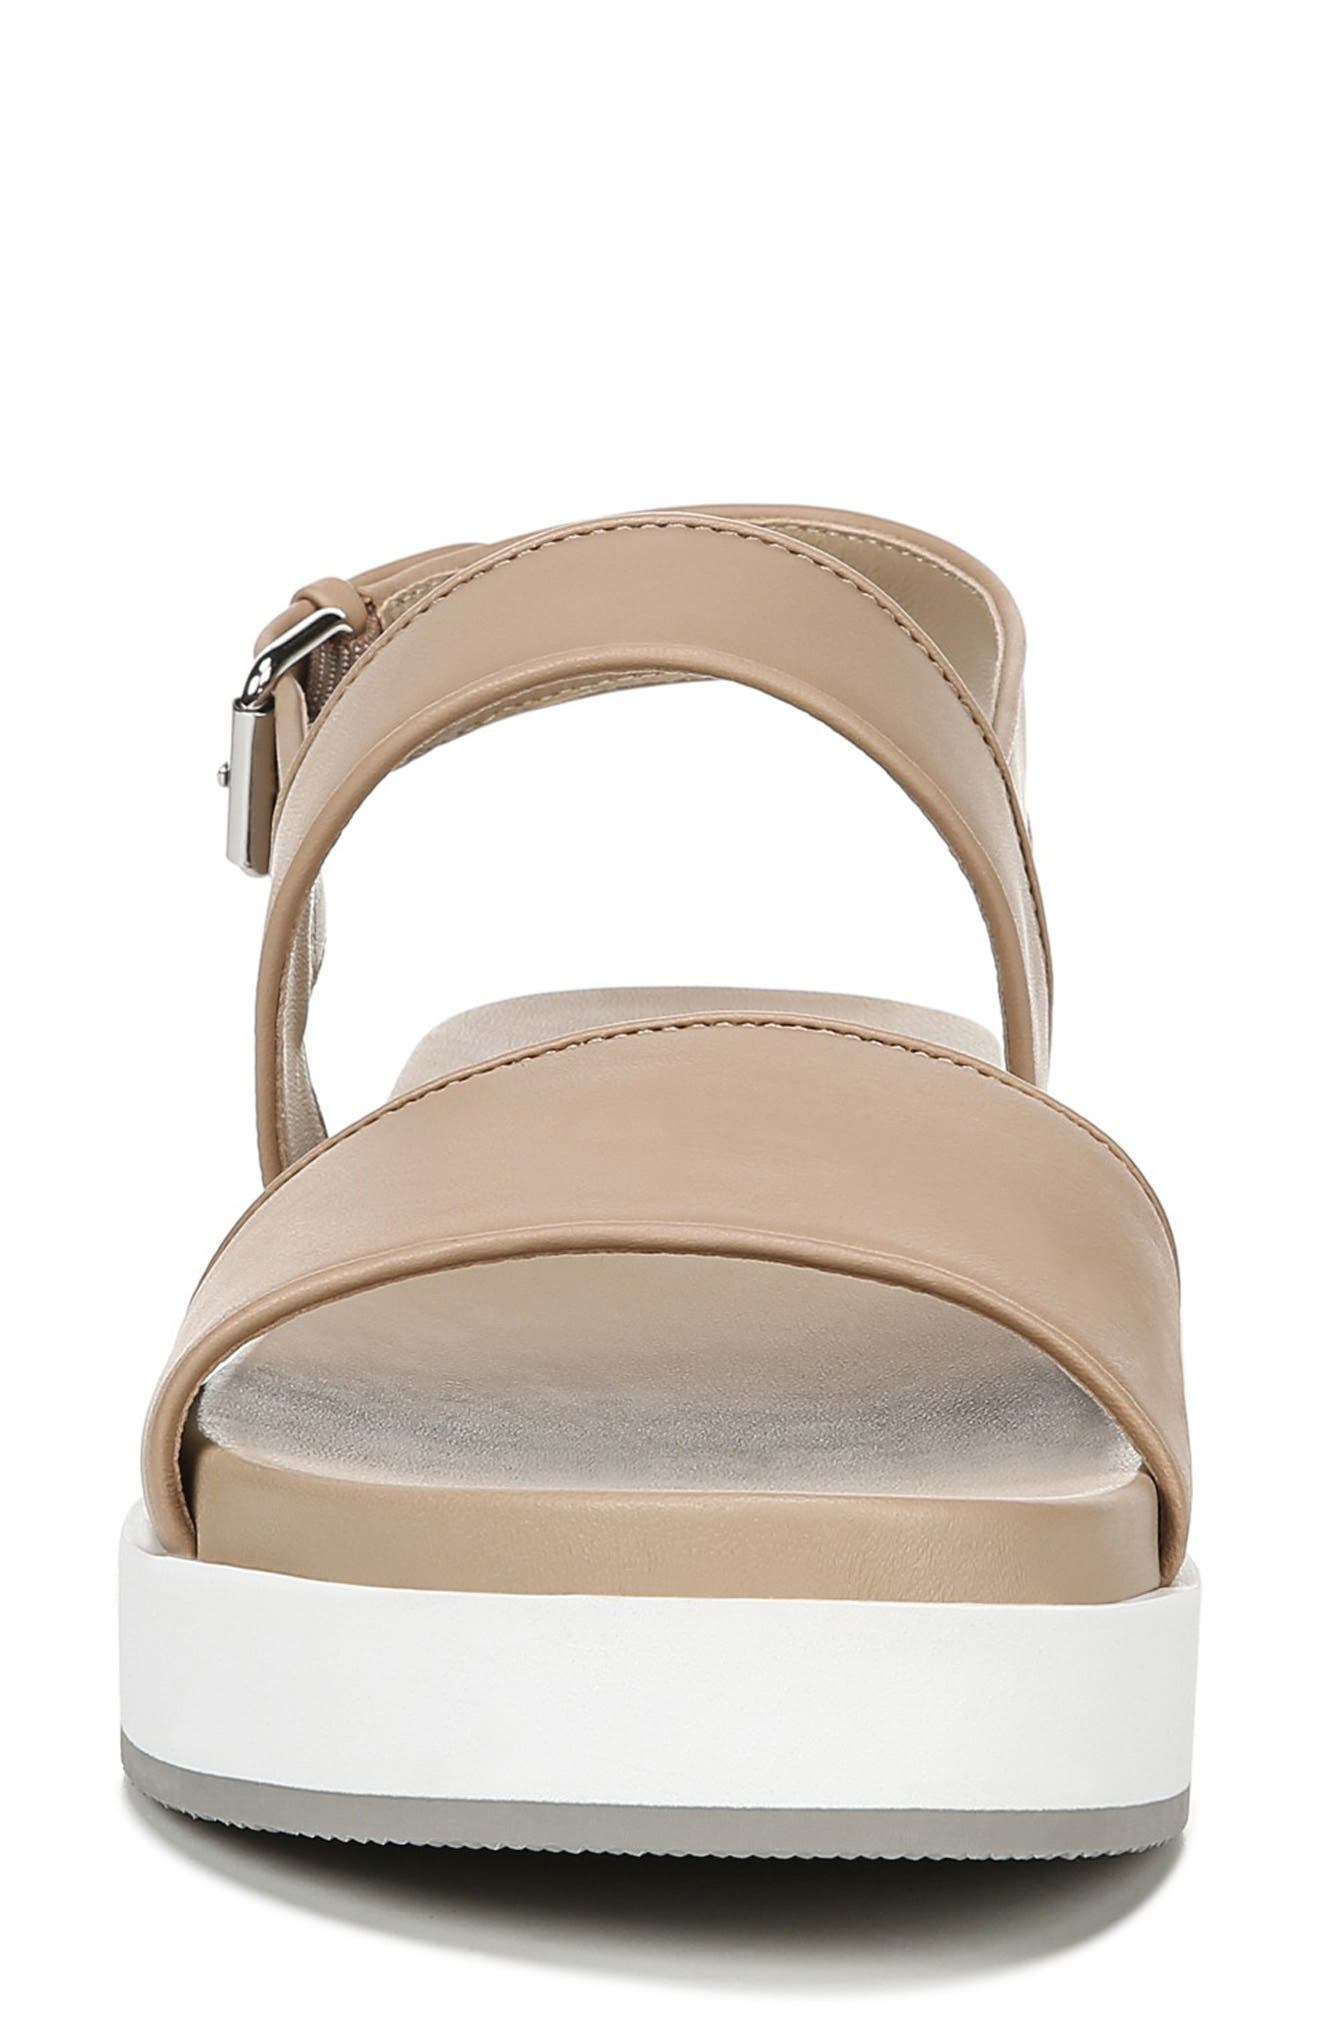 VIA SPIGA, Davi Platform Sandal, Alternate thumbnail 4, color, DESERT NAPPA